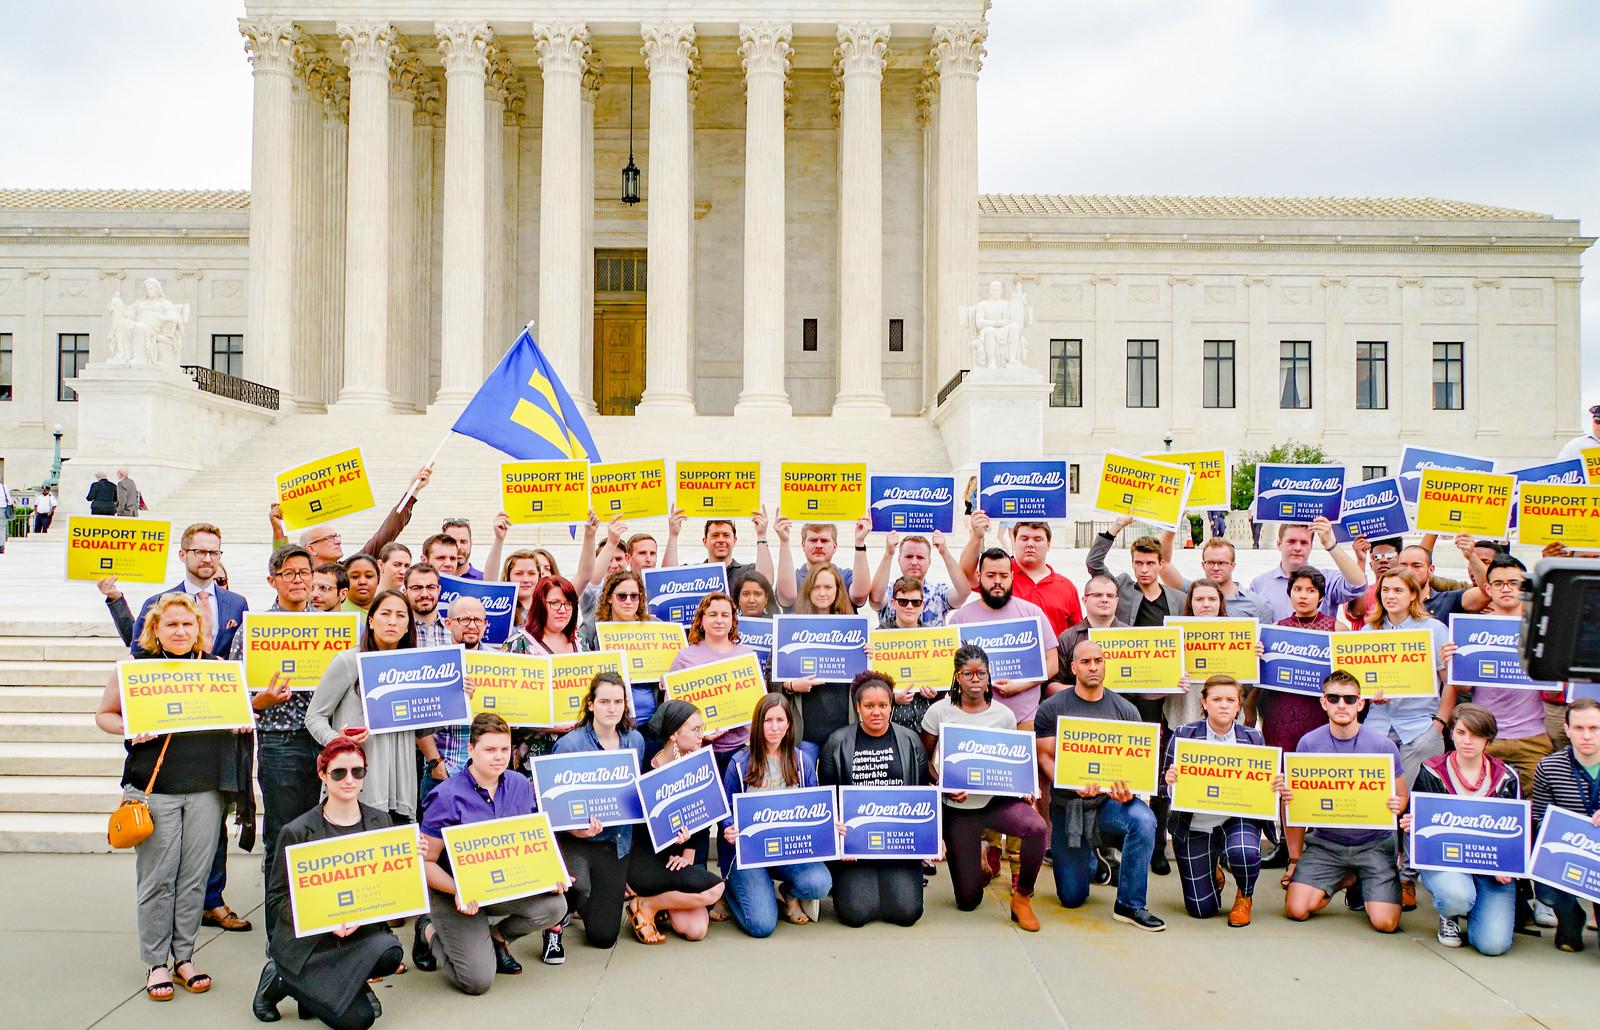 2018.06.04 SCOTUS Rally, Masterpiece Cake Case, Washington, DC USA 02721